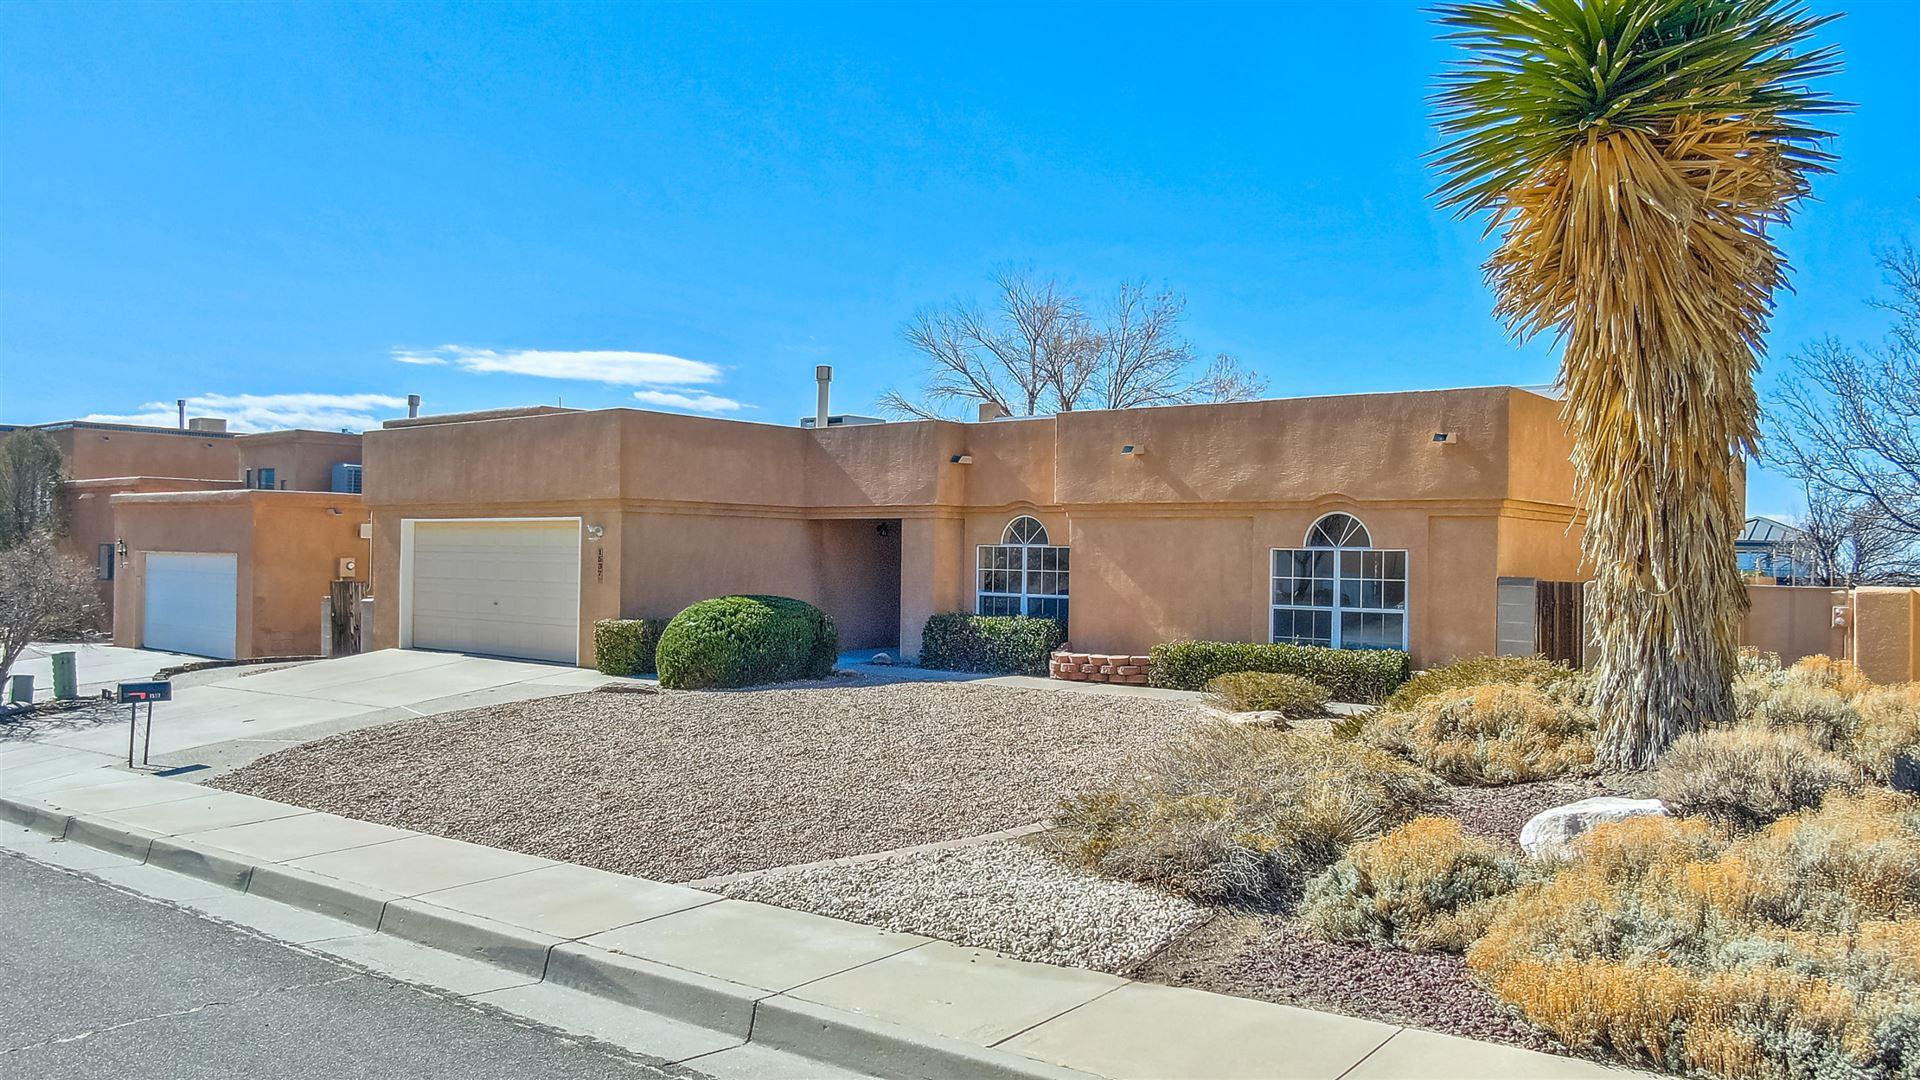 1537 ARCHULETA Drive NE, Albuquerque, NM 87112 - MLS#: 985313